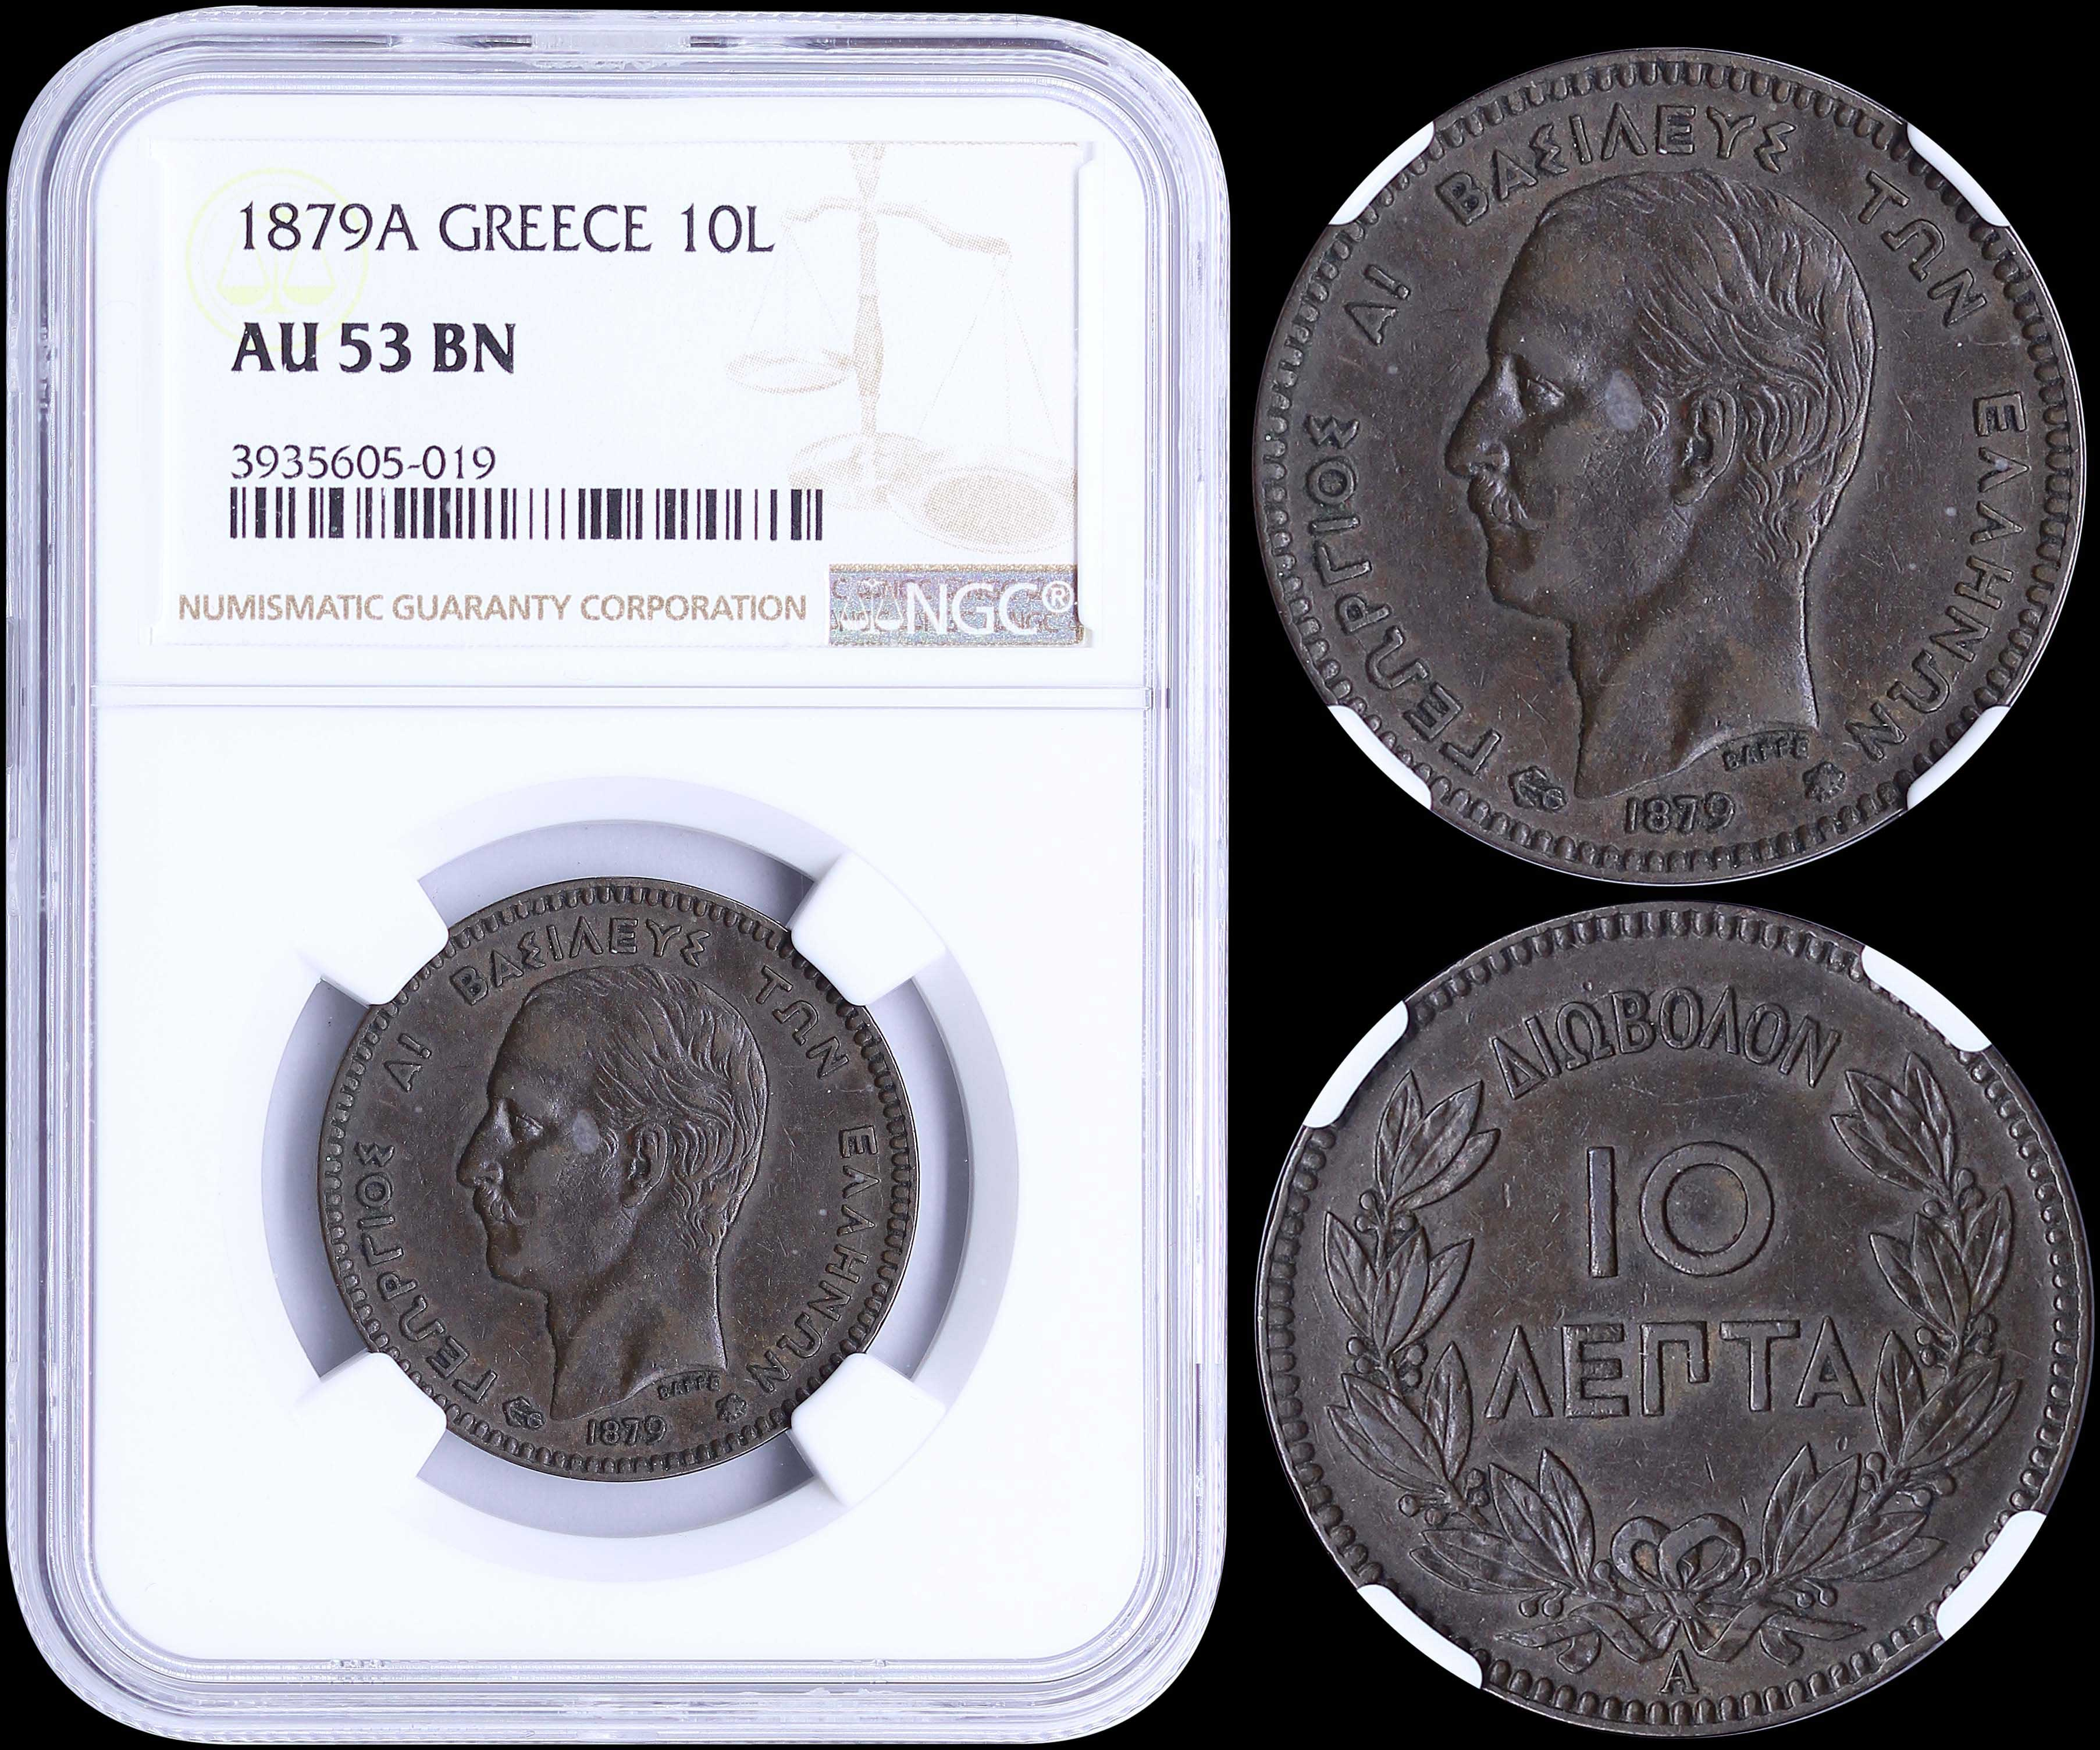 Lot 8141 - -  COINS & TOKENS king george i -  A. Karamitsos Public & Live Bid Auction 644 Coins, Medals & Banknotes